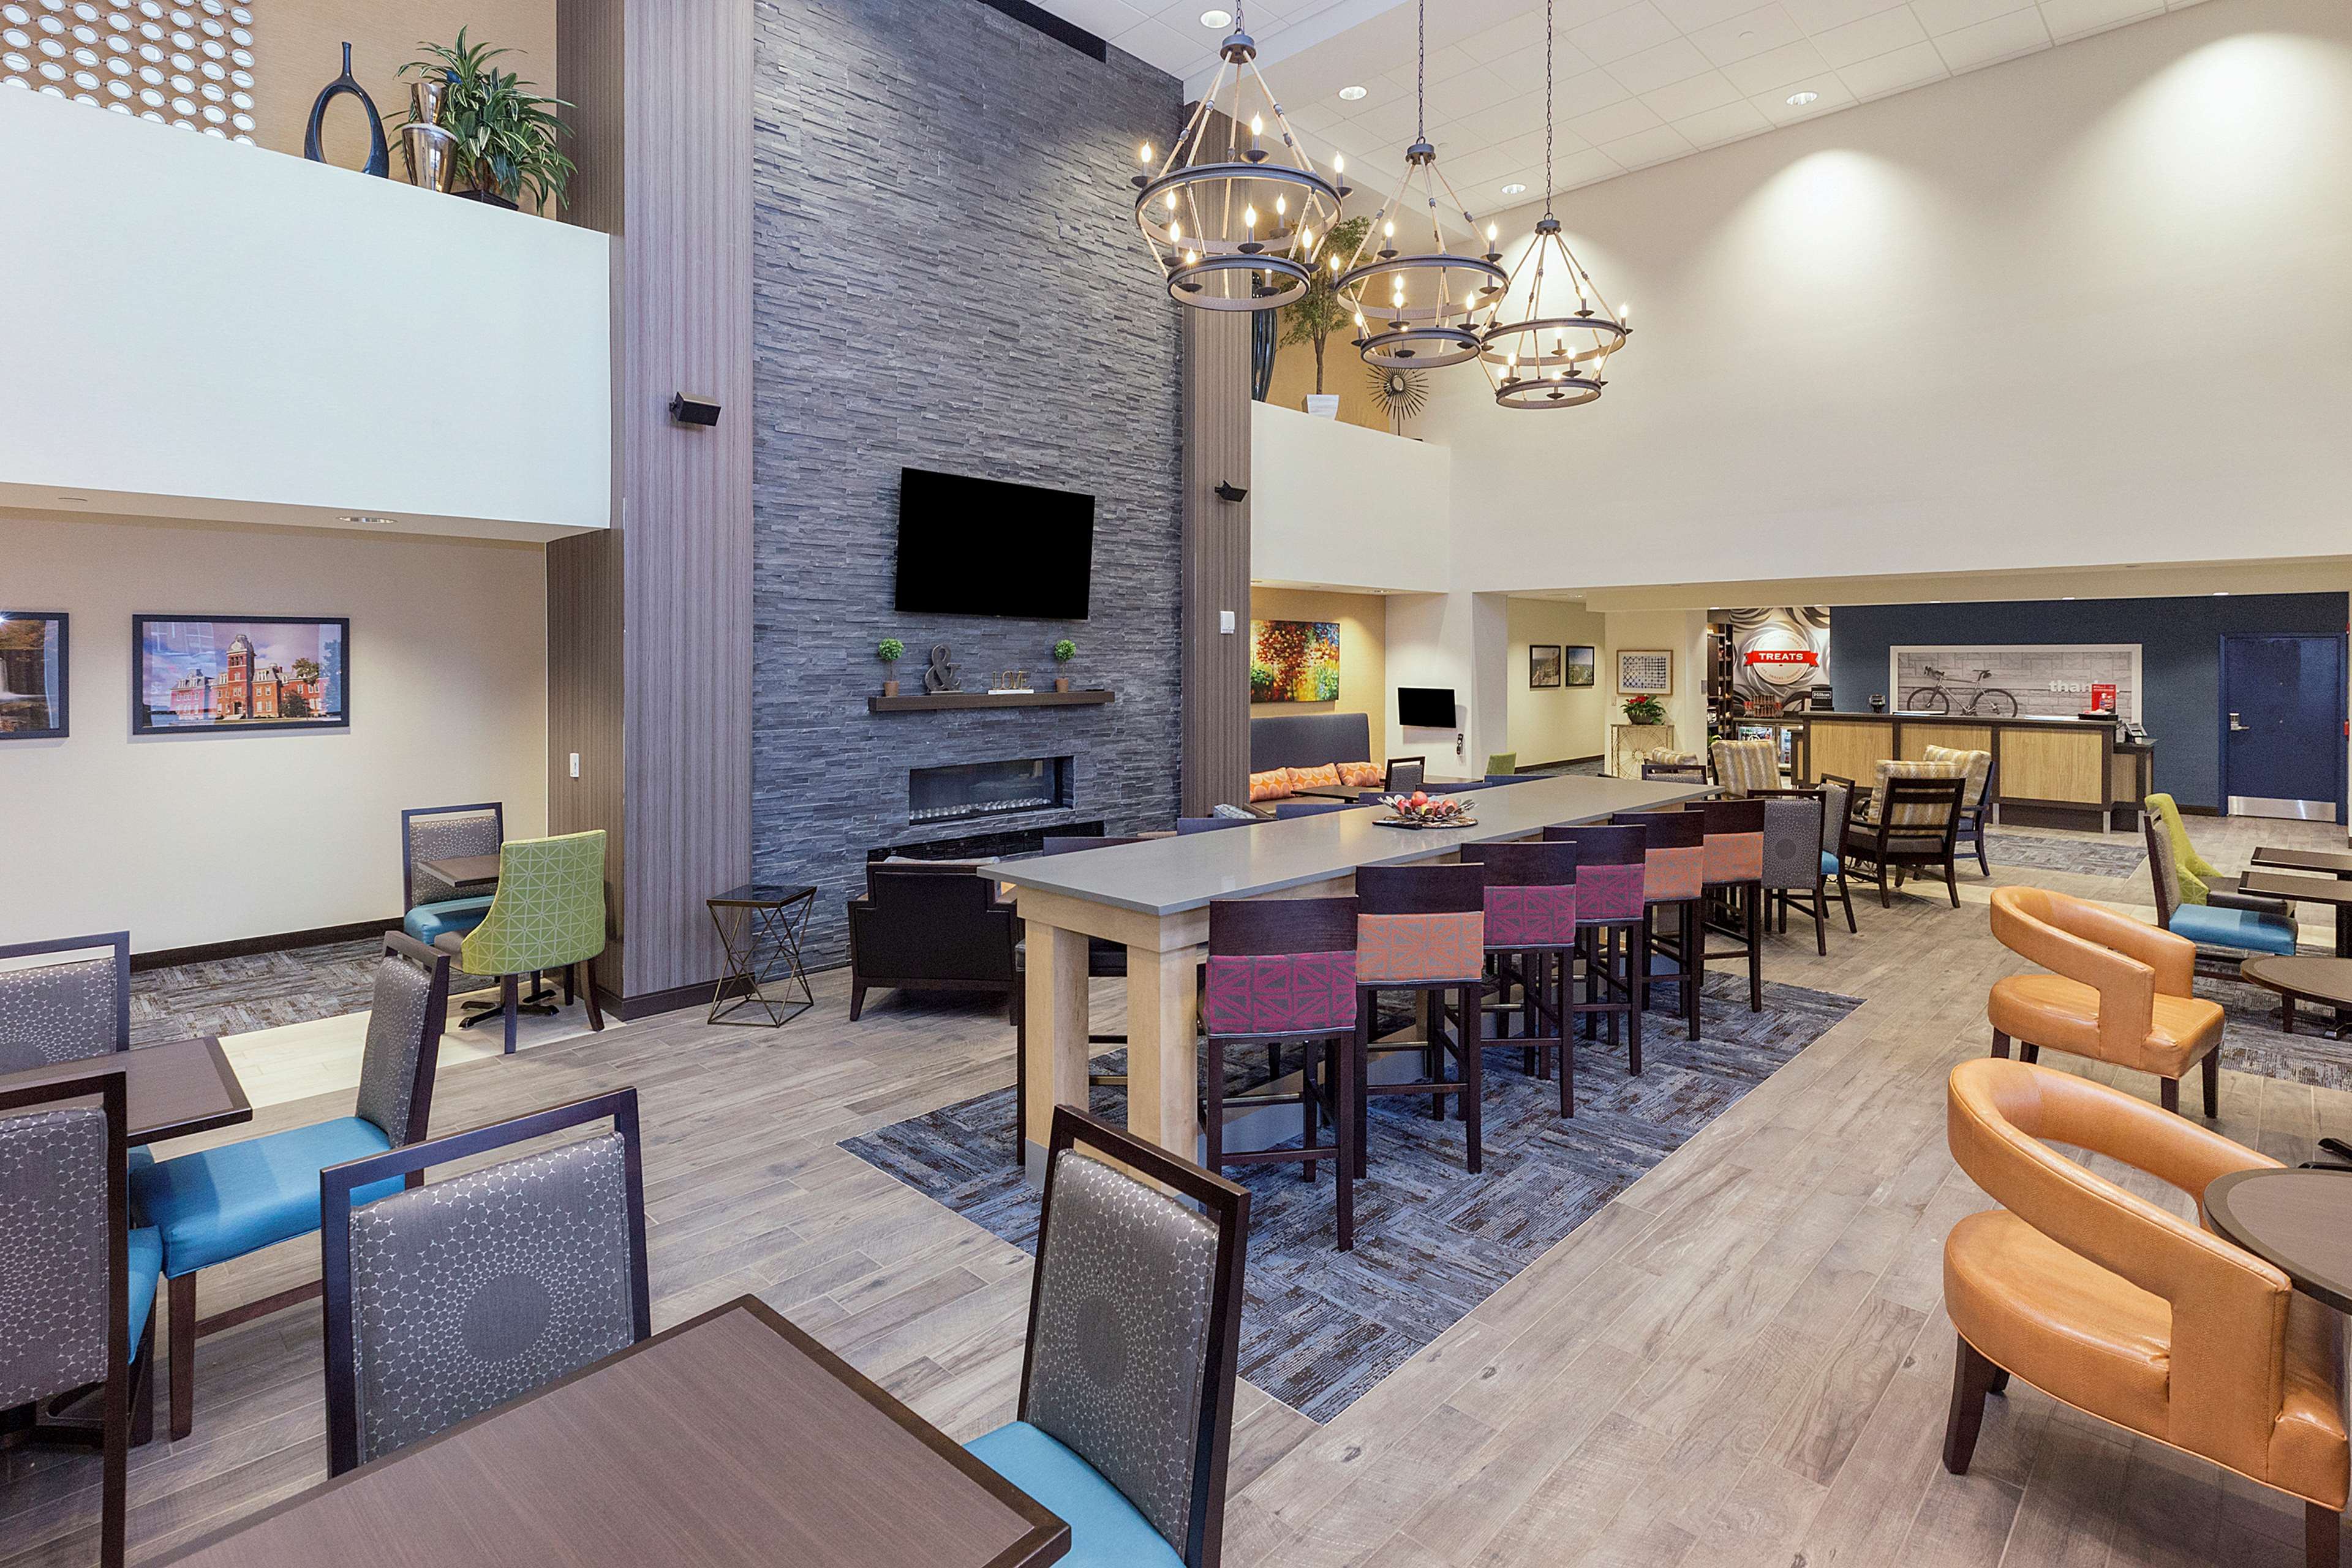 Hampton Inn & Suites Morgantown / University Town Centre image 4